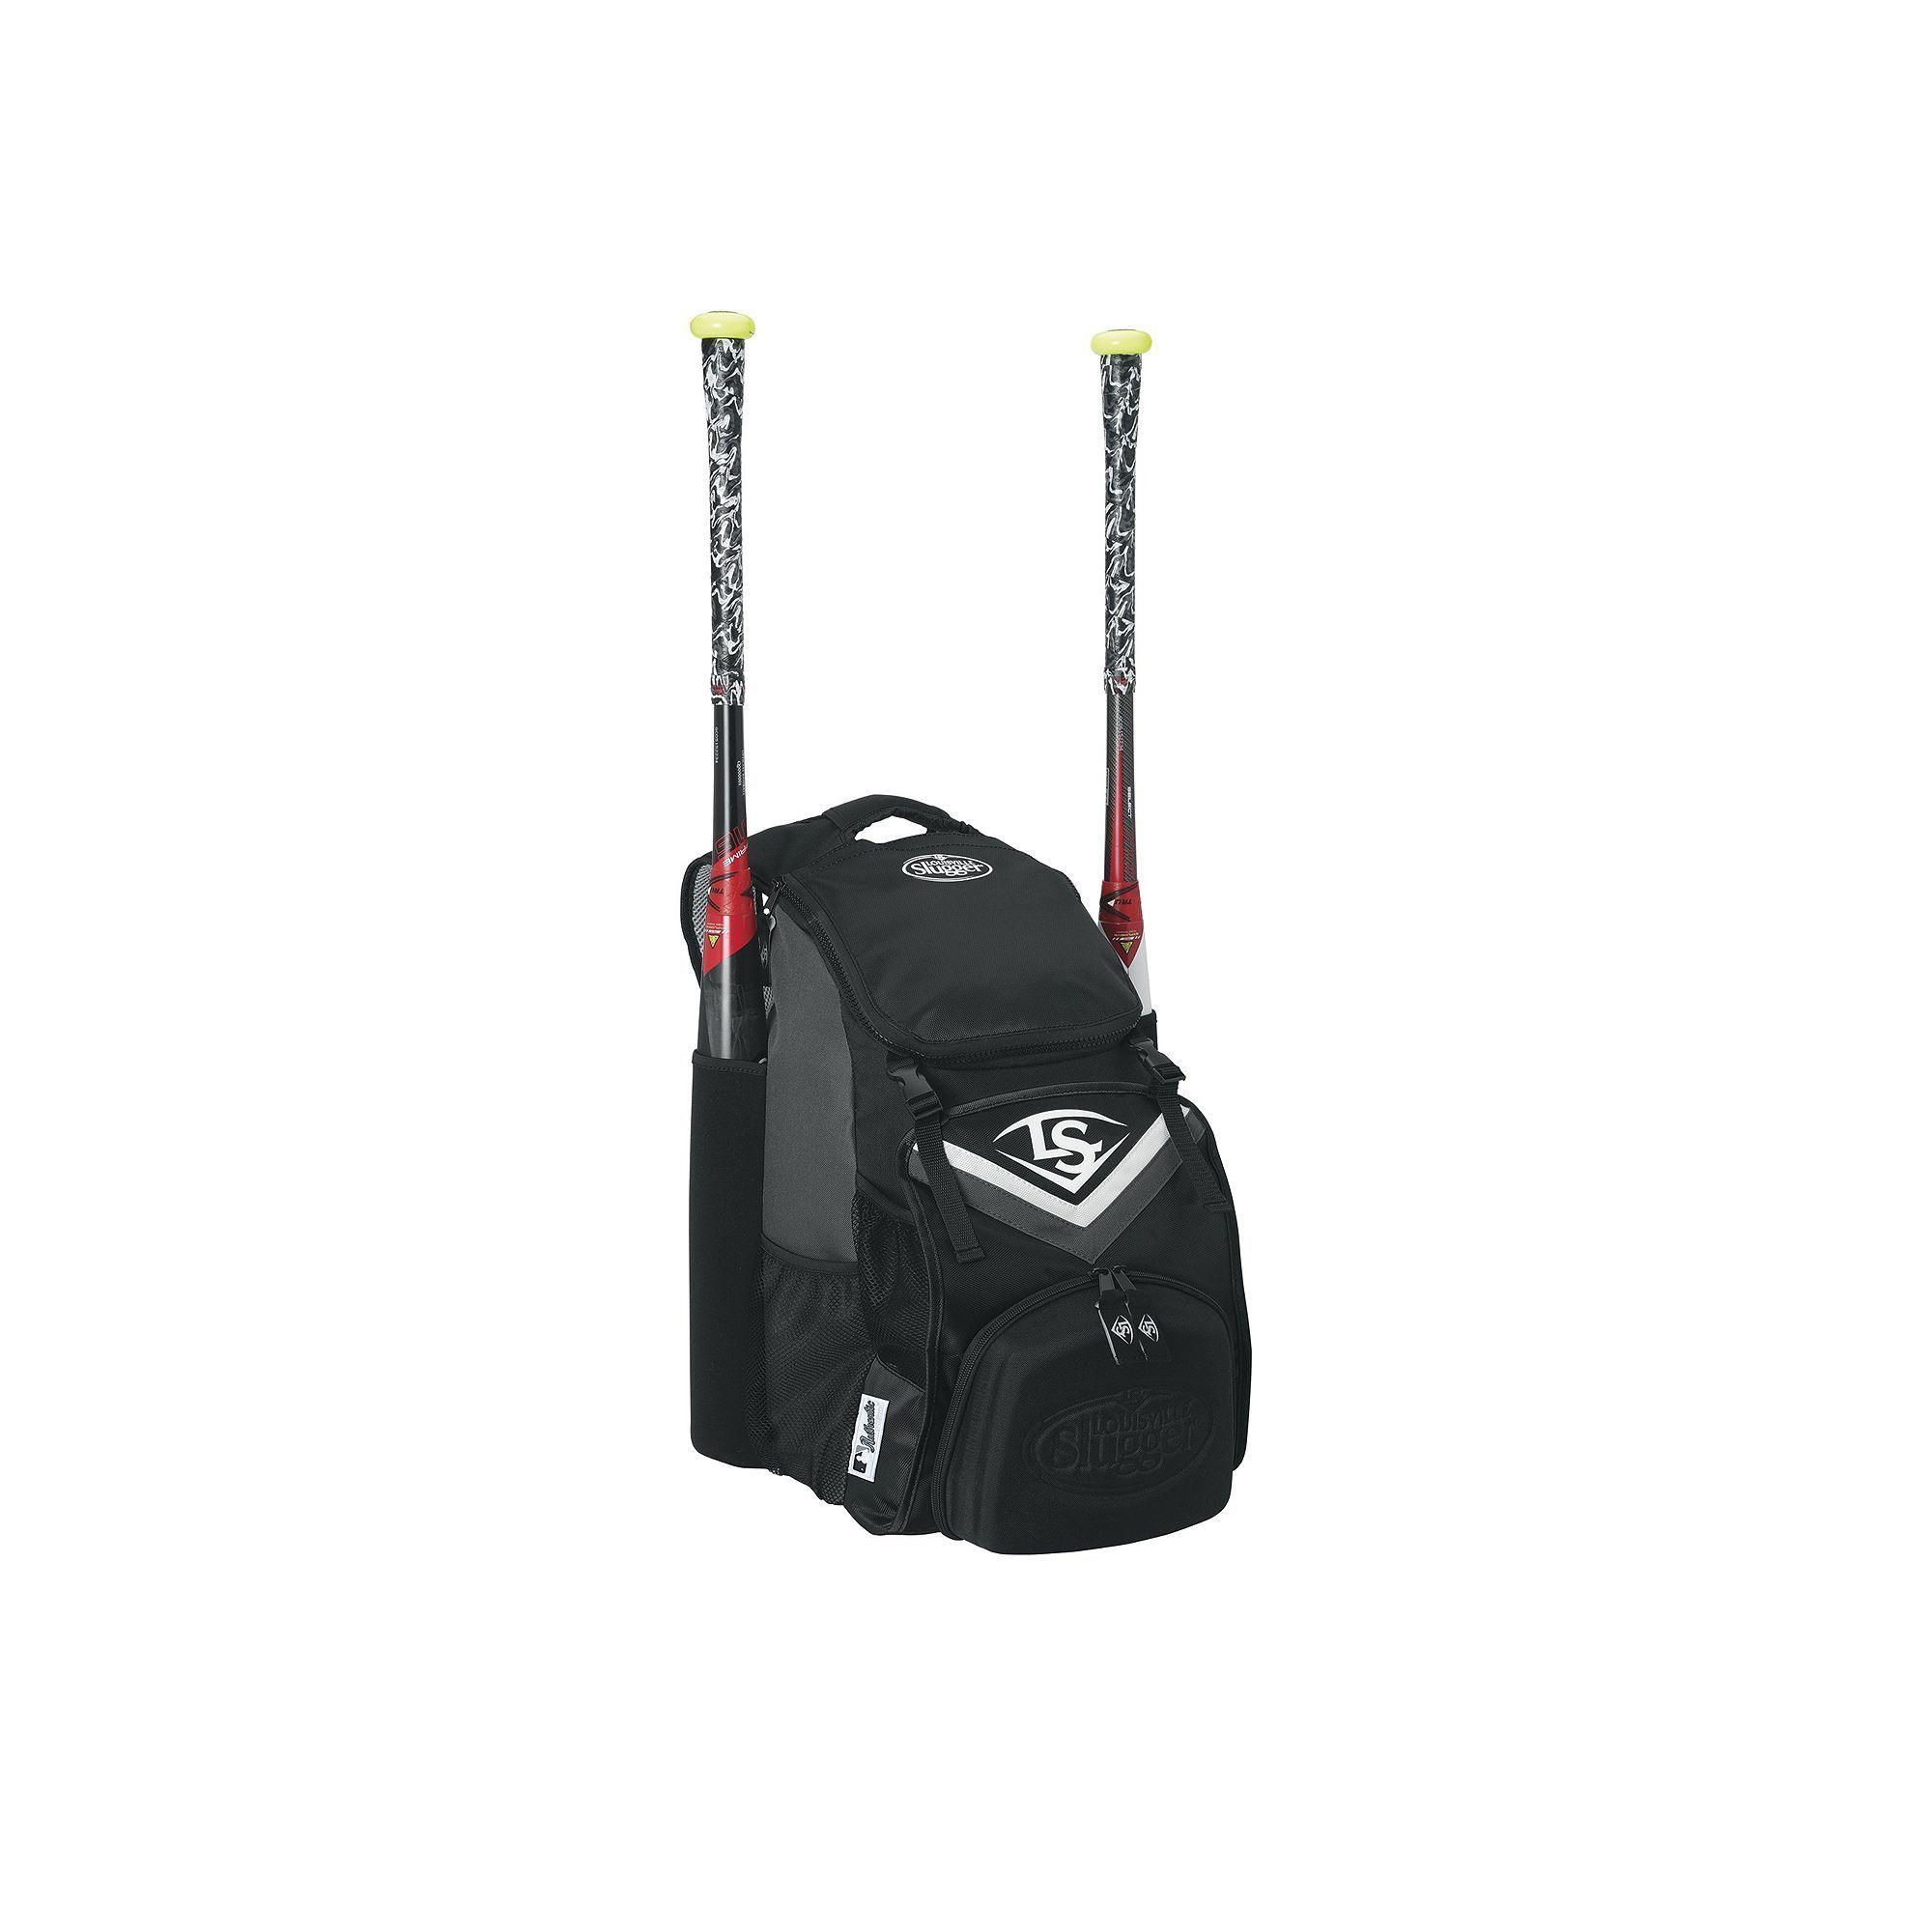 d8a24f25cb39 Louisville Slugger EB Series 7 Stick Baseball Backpack